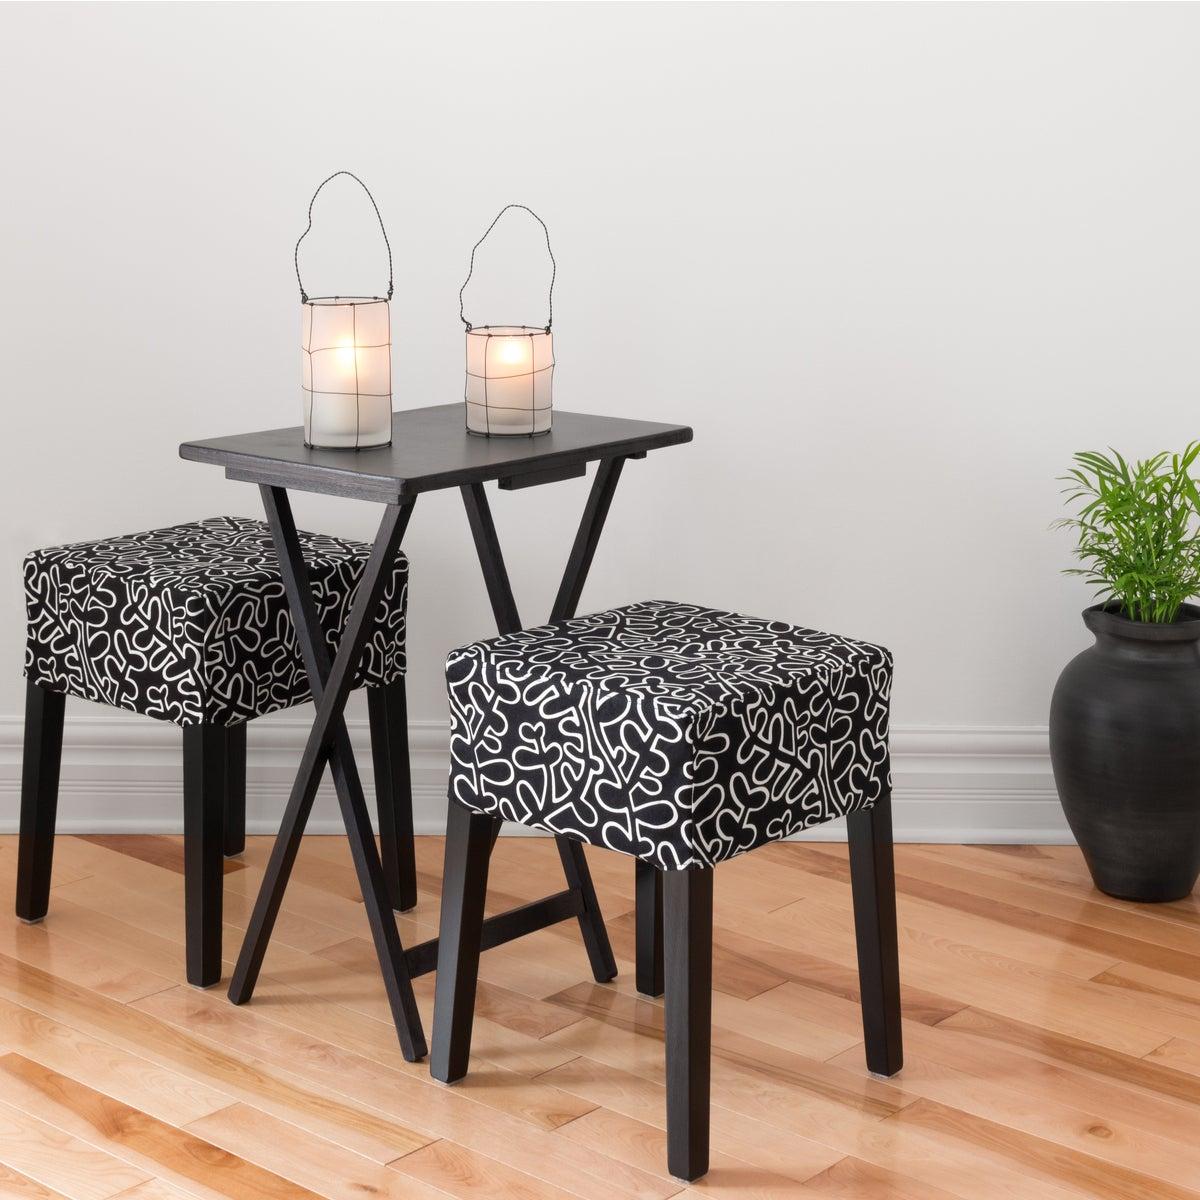 Mesa en negro plegable con taburetes tapizados